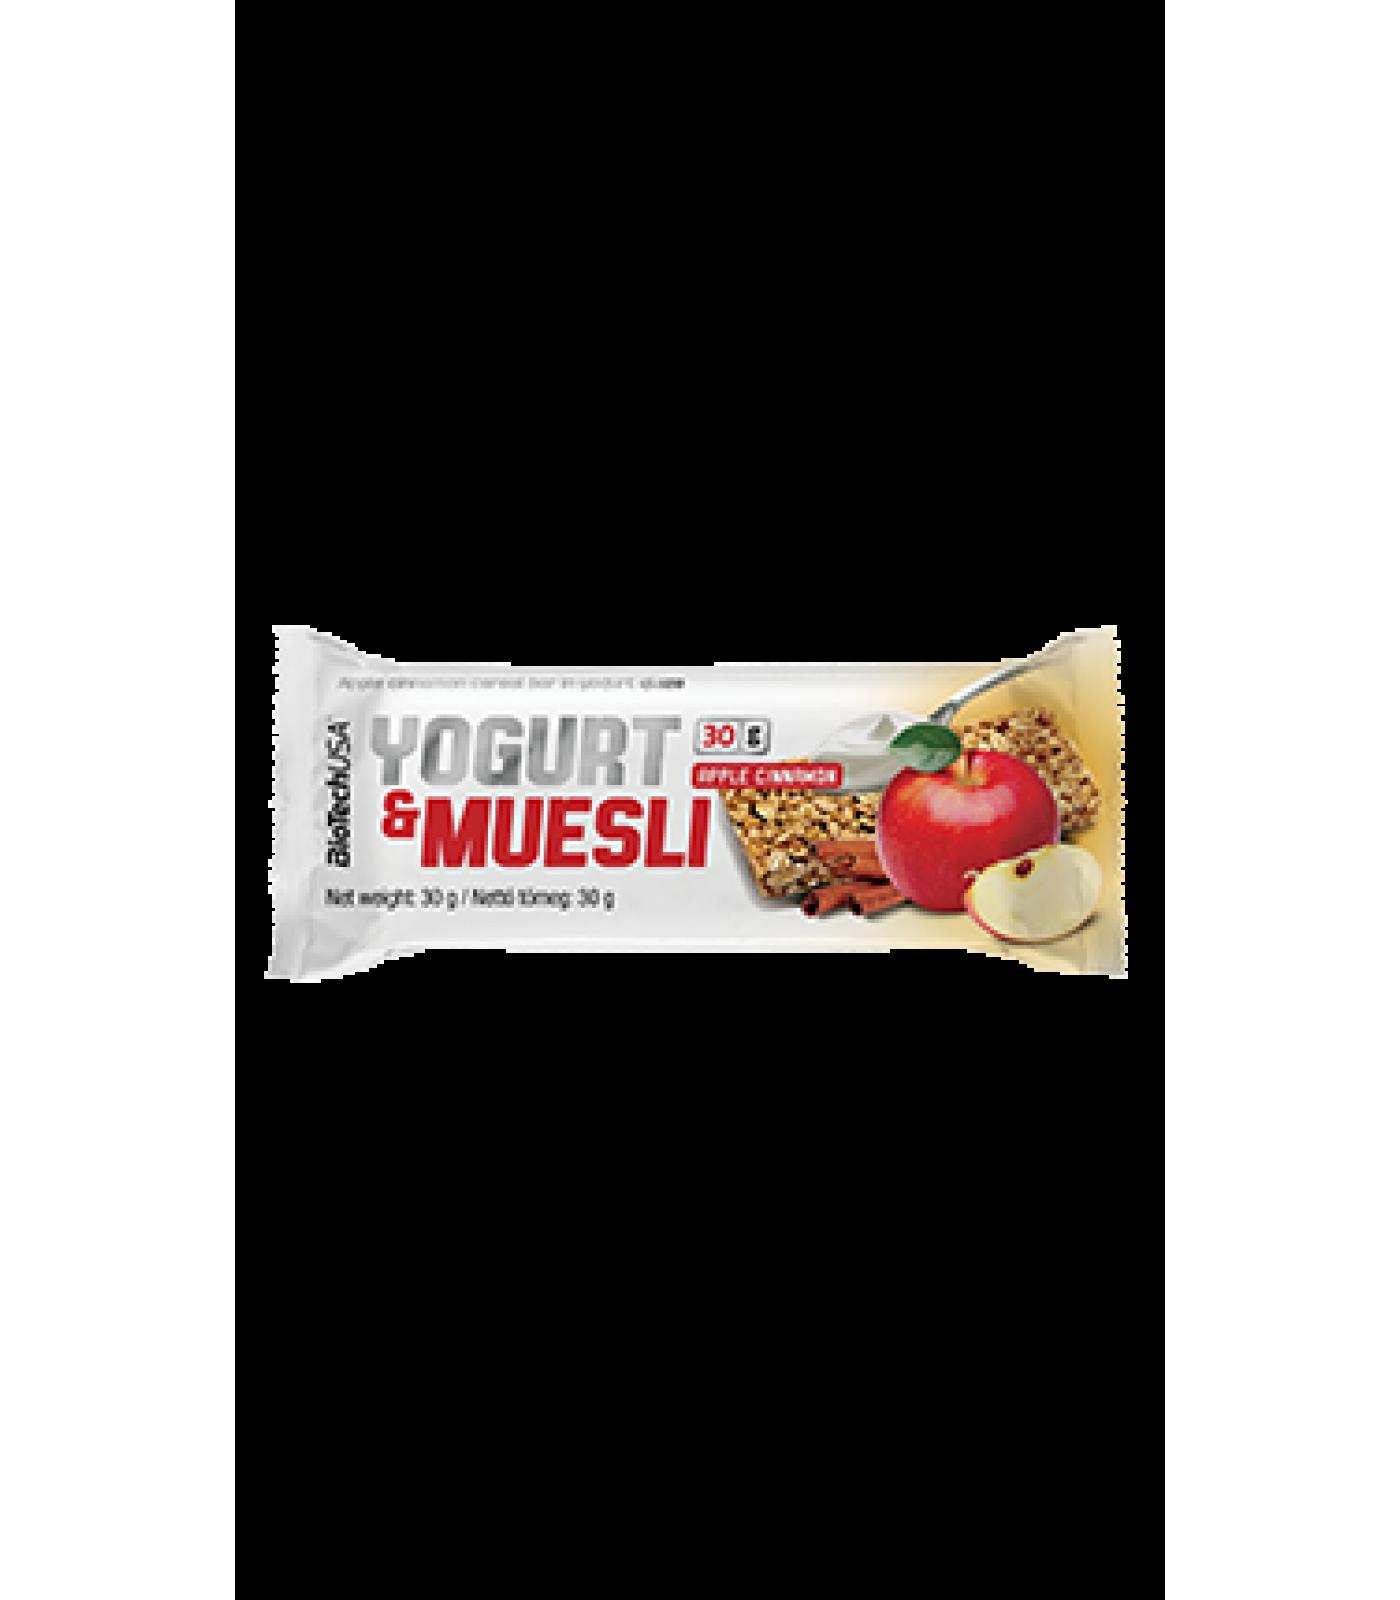 BioTech - Yogurt and Musli Bar / 30g